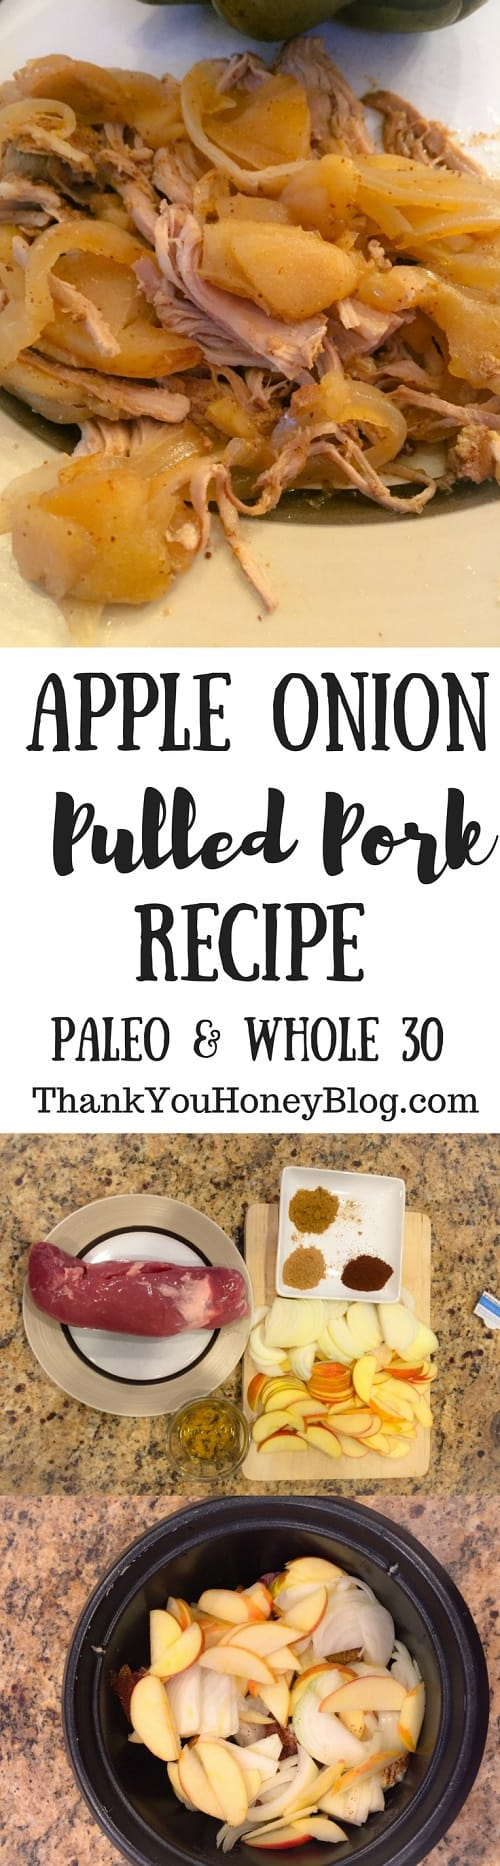 whole30-apple-onion-pulled-pork